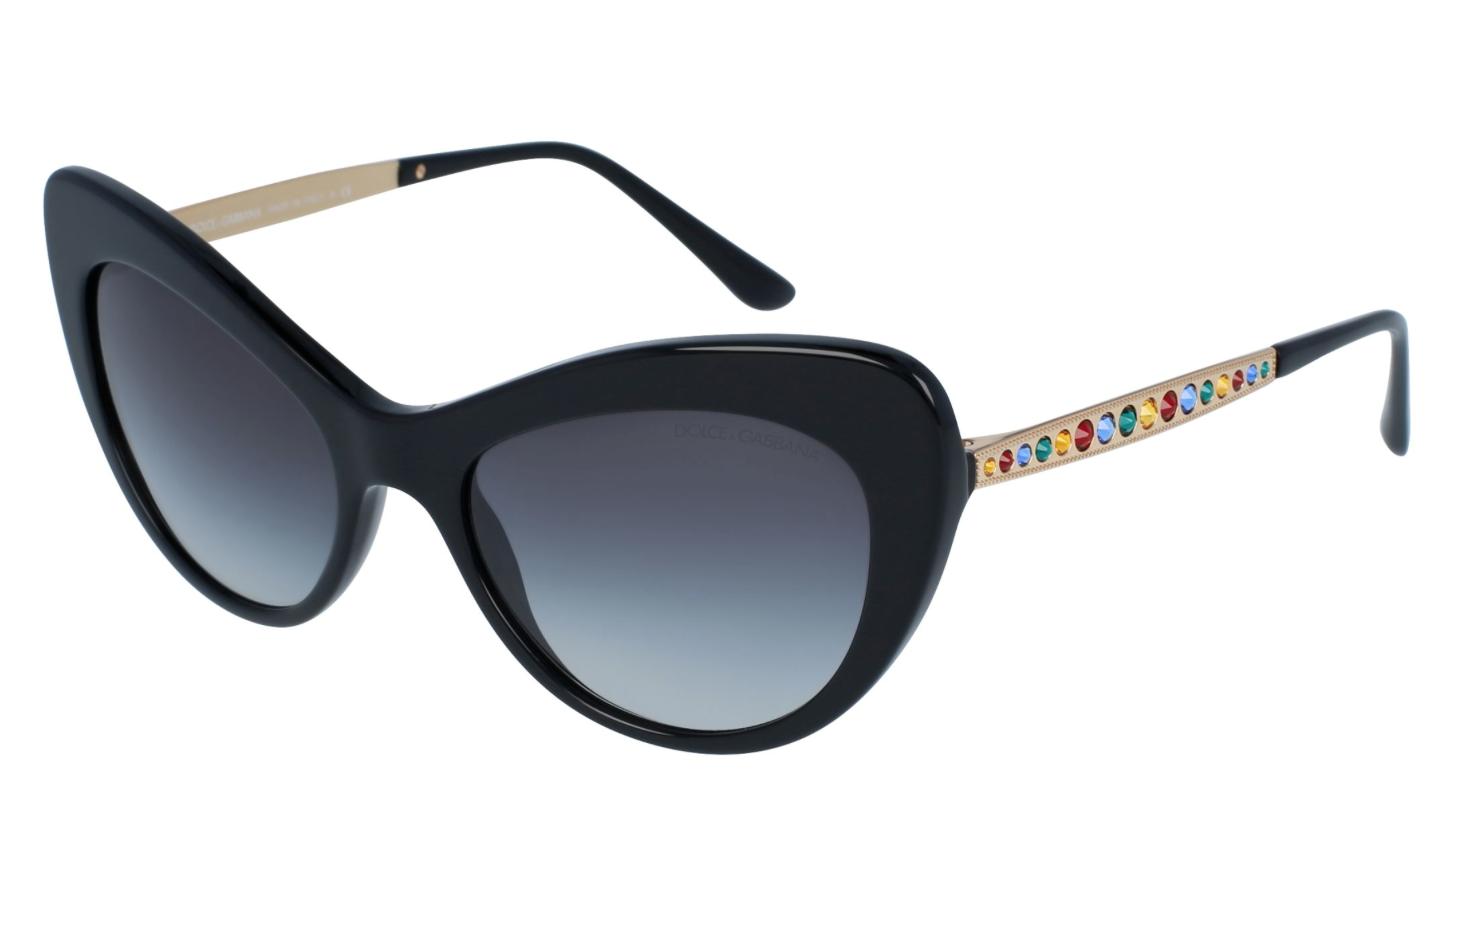 NEW DOLCE & GABBANA MAMBO Sunglasses DG4307B 501/8G Black Gold Grey Gradient